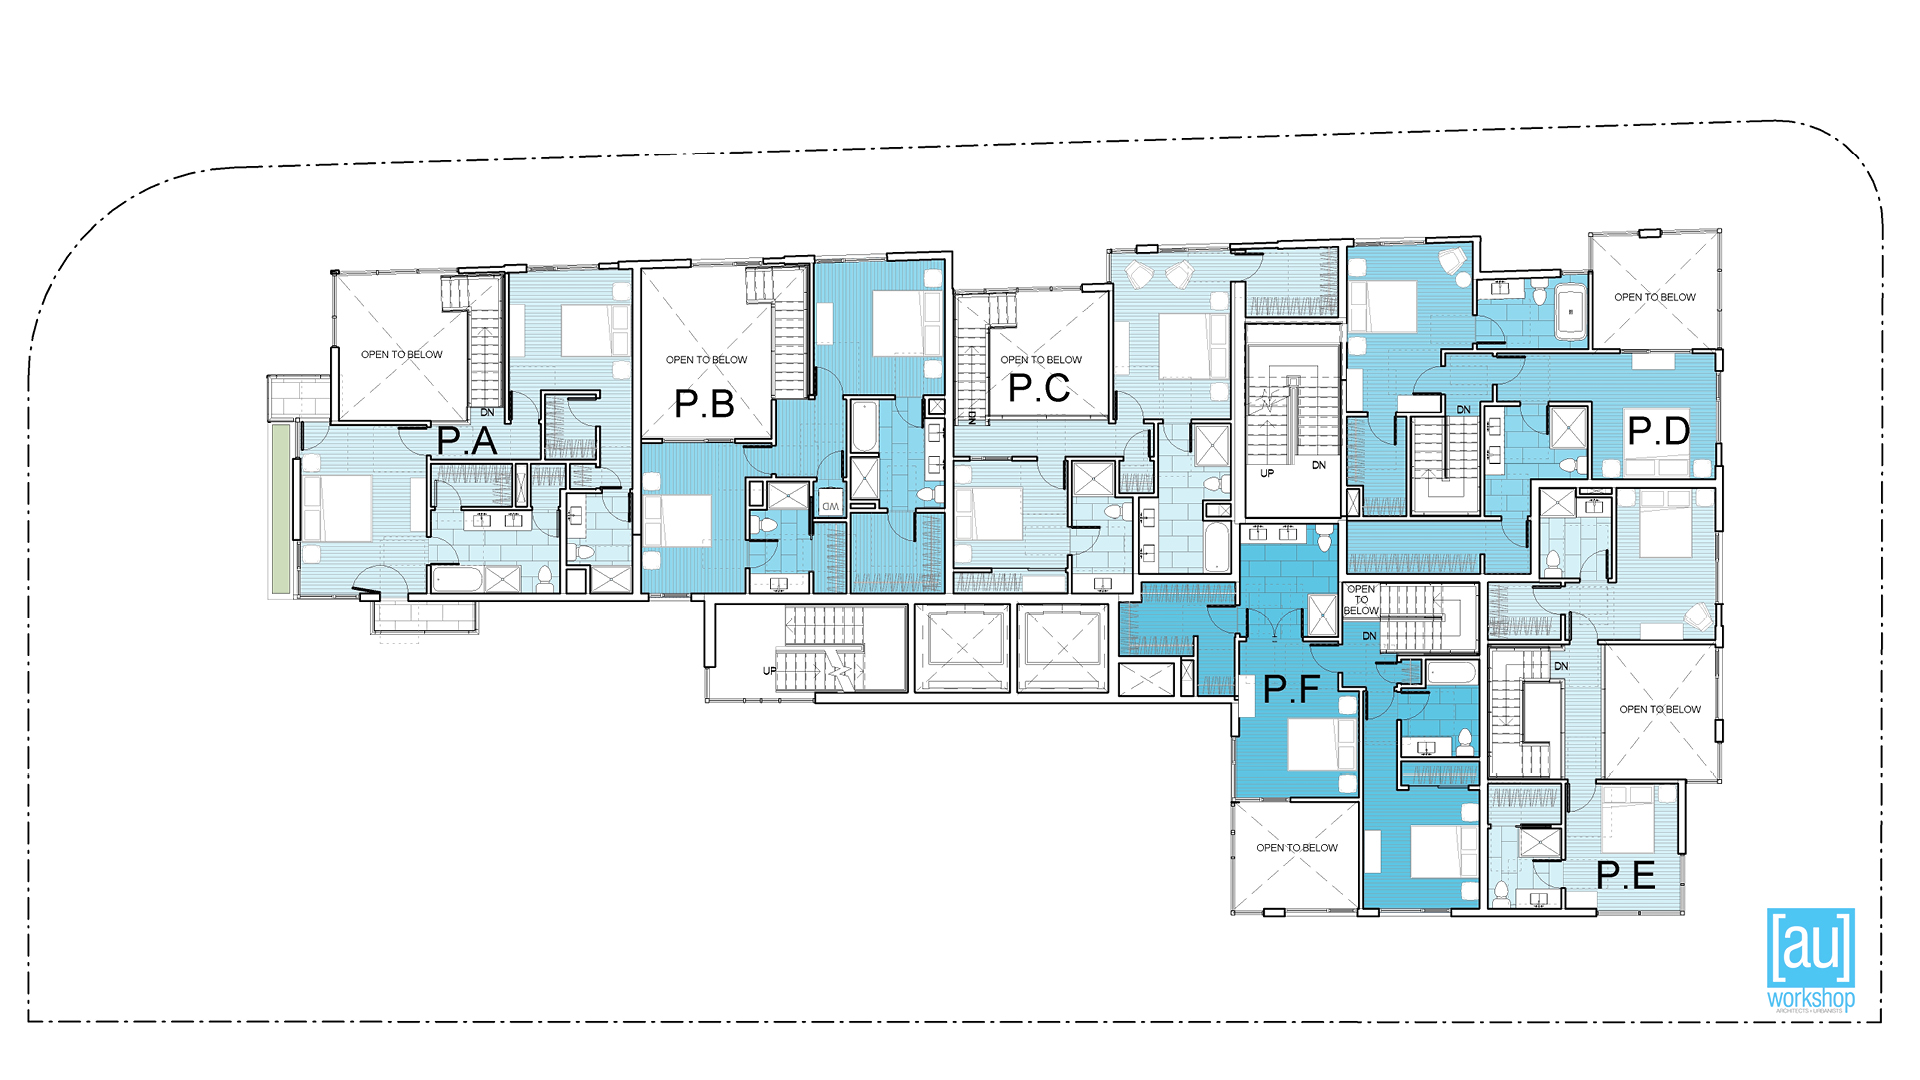 Penthouse Mezzanine Plan